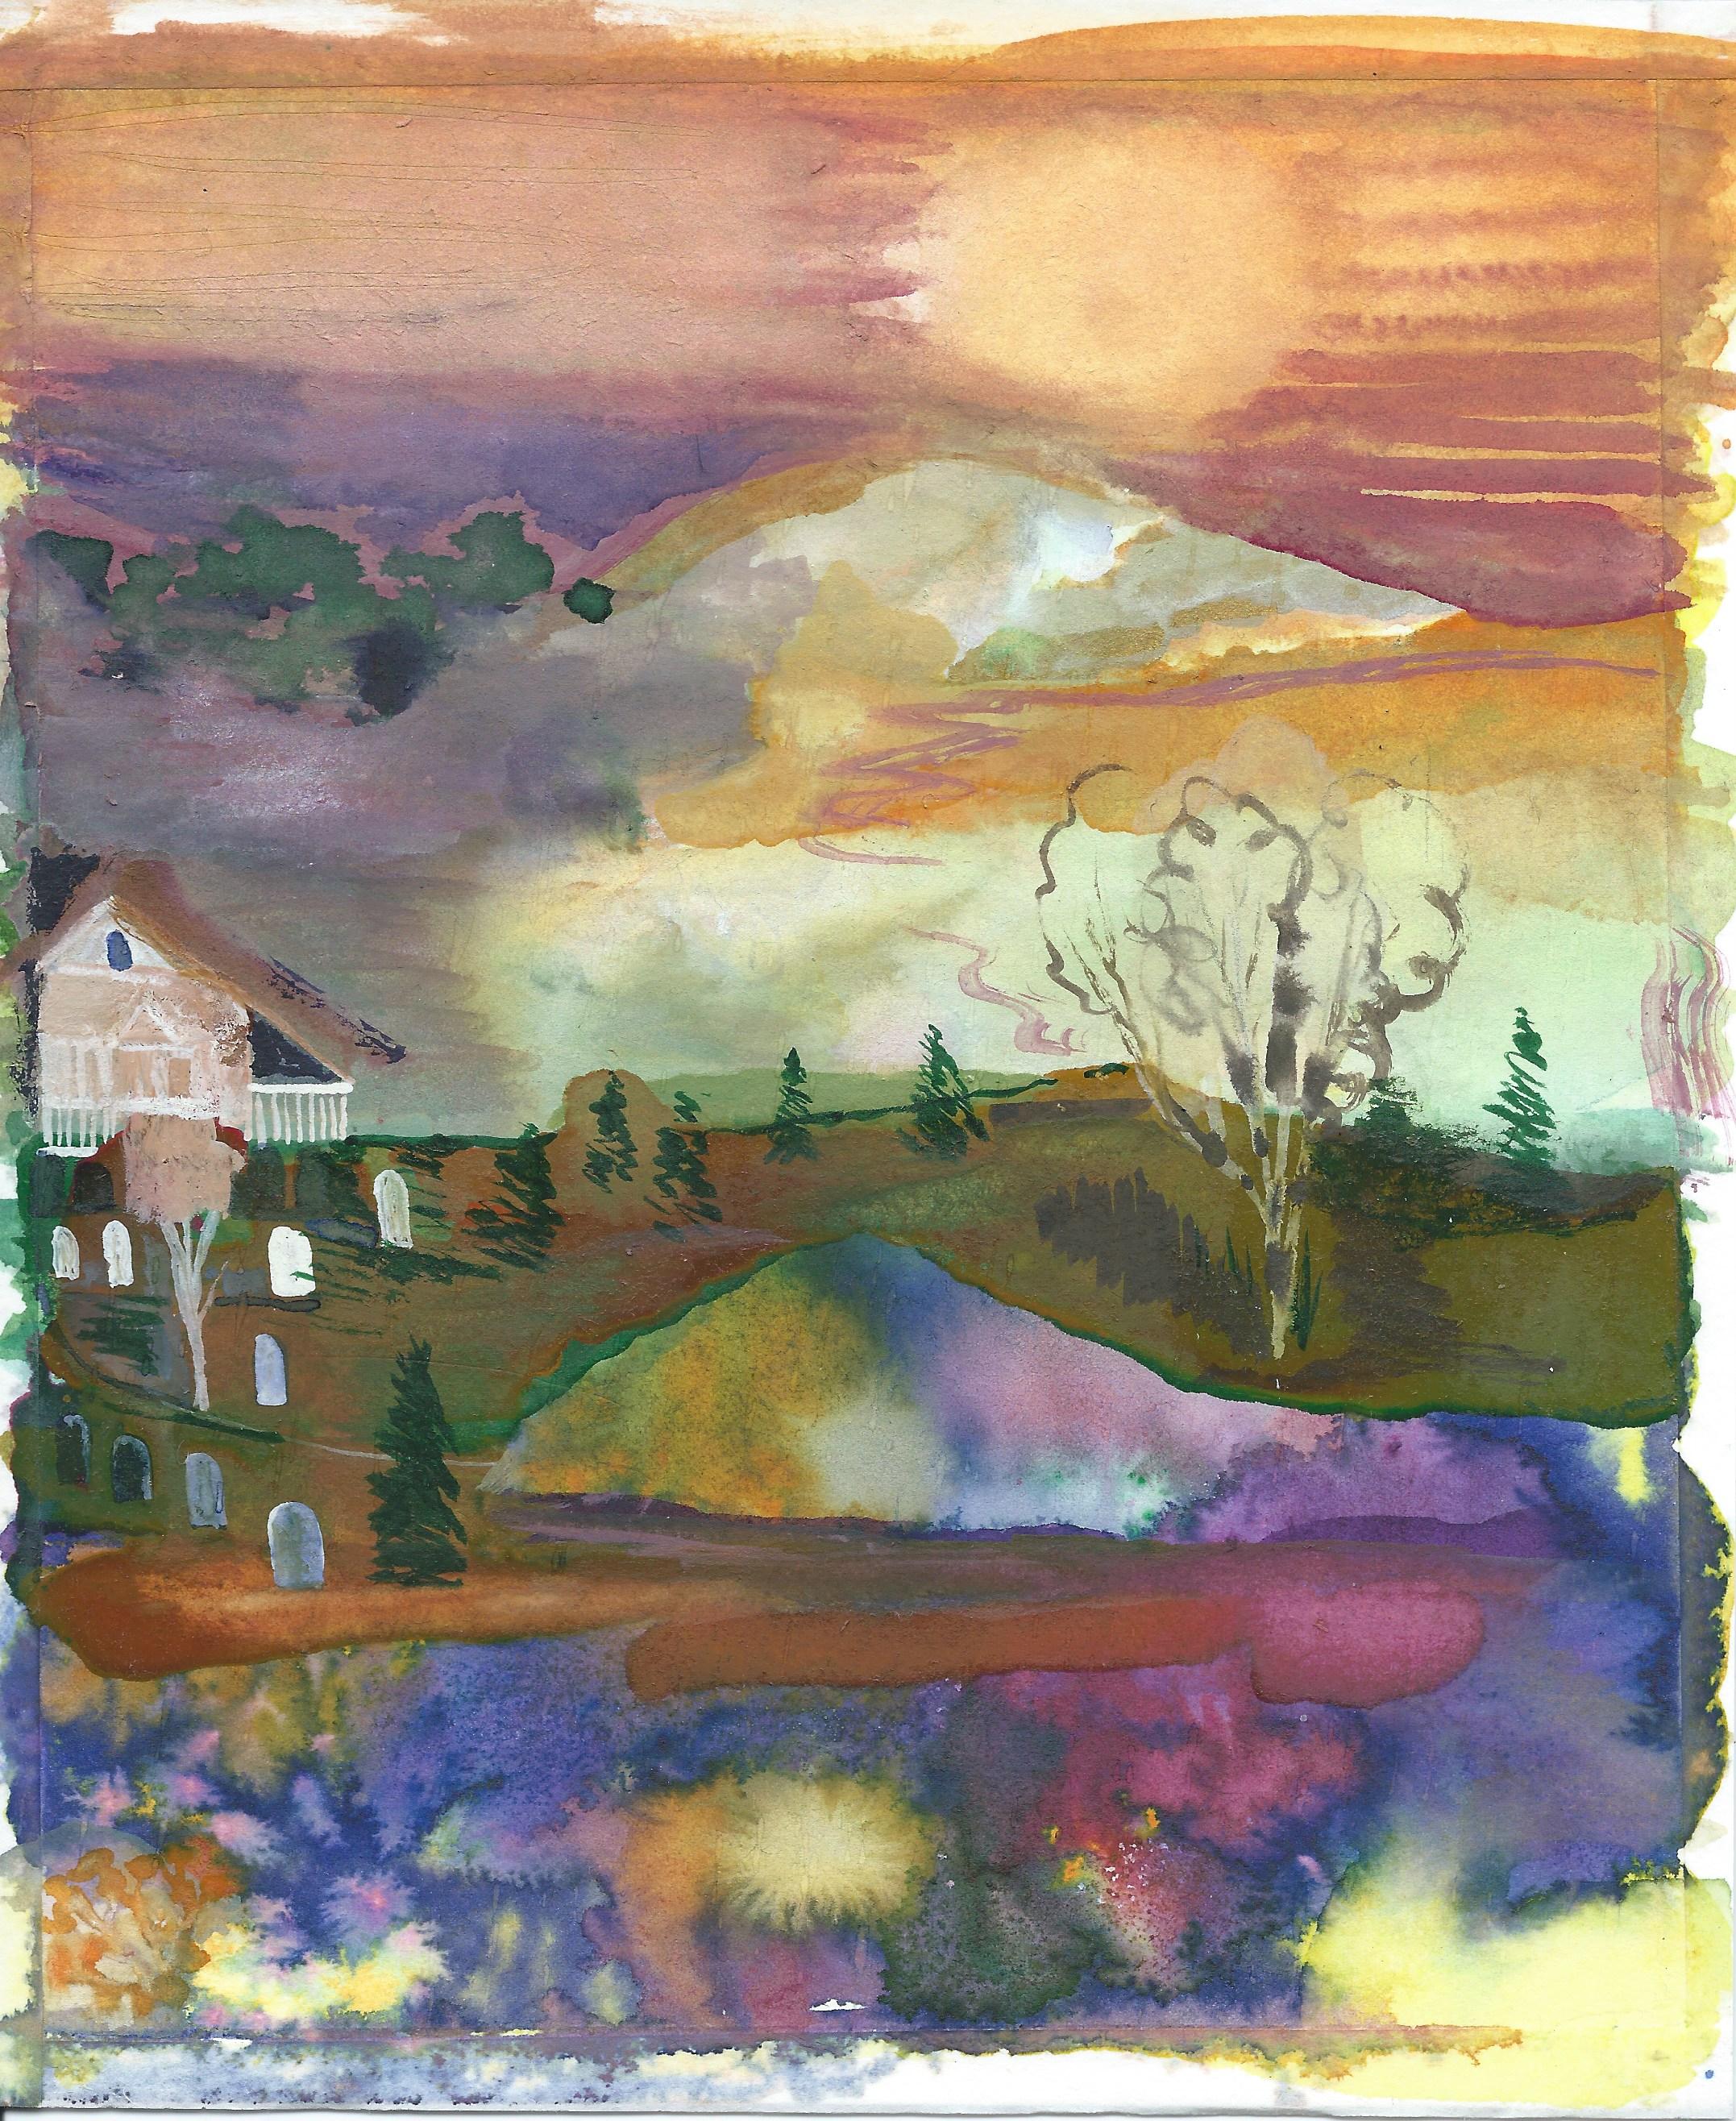 Memory Lane watercolor on paper, 22 x 18.5 cm 2017